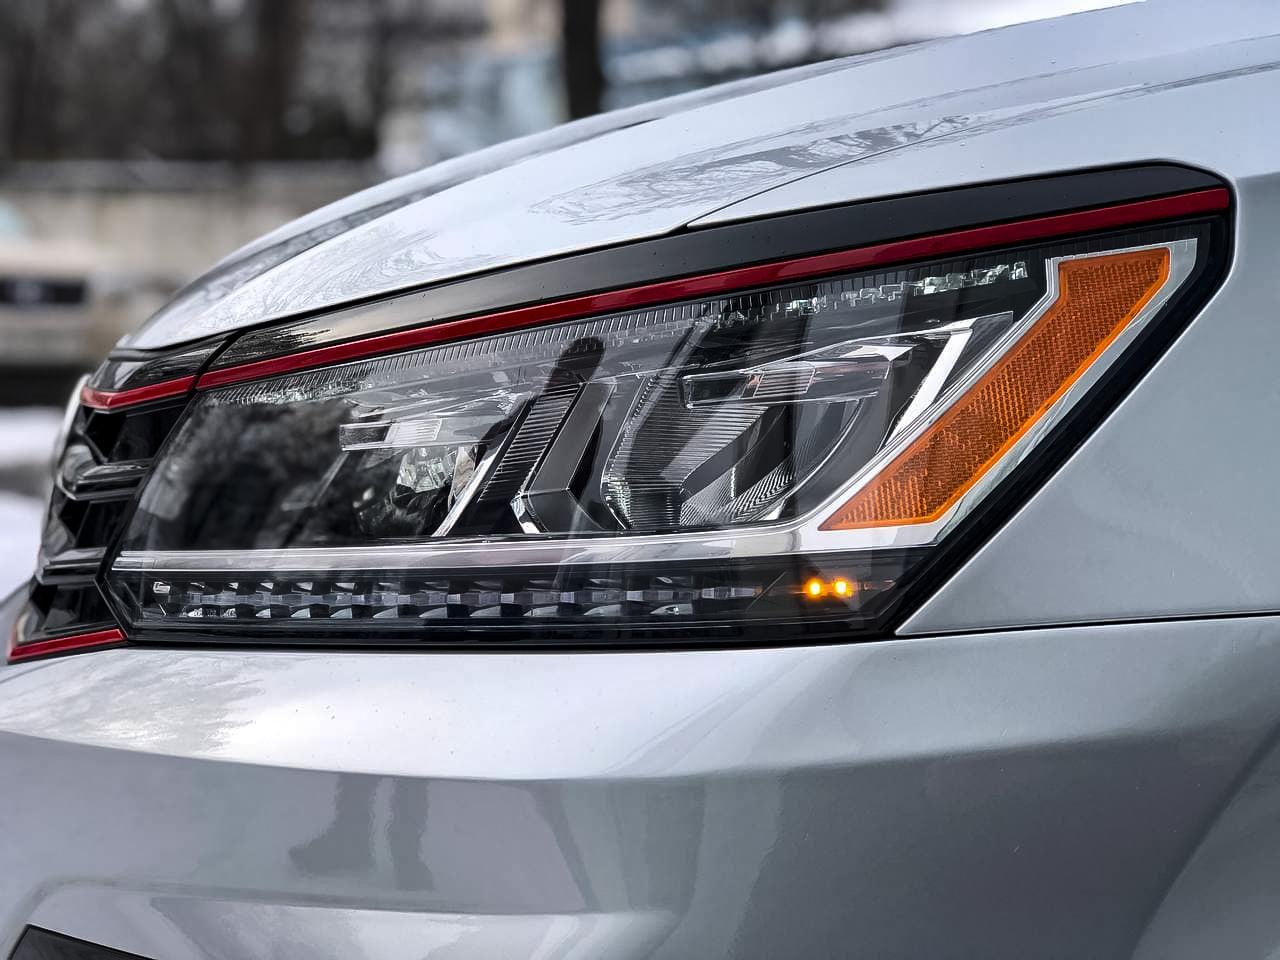 2018 Volkswagen PASSAT   Vin: 1VWJM7A30JC050582